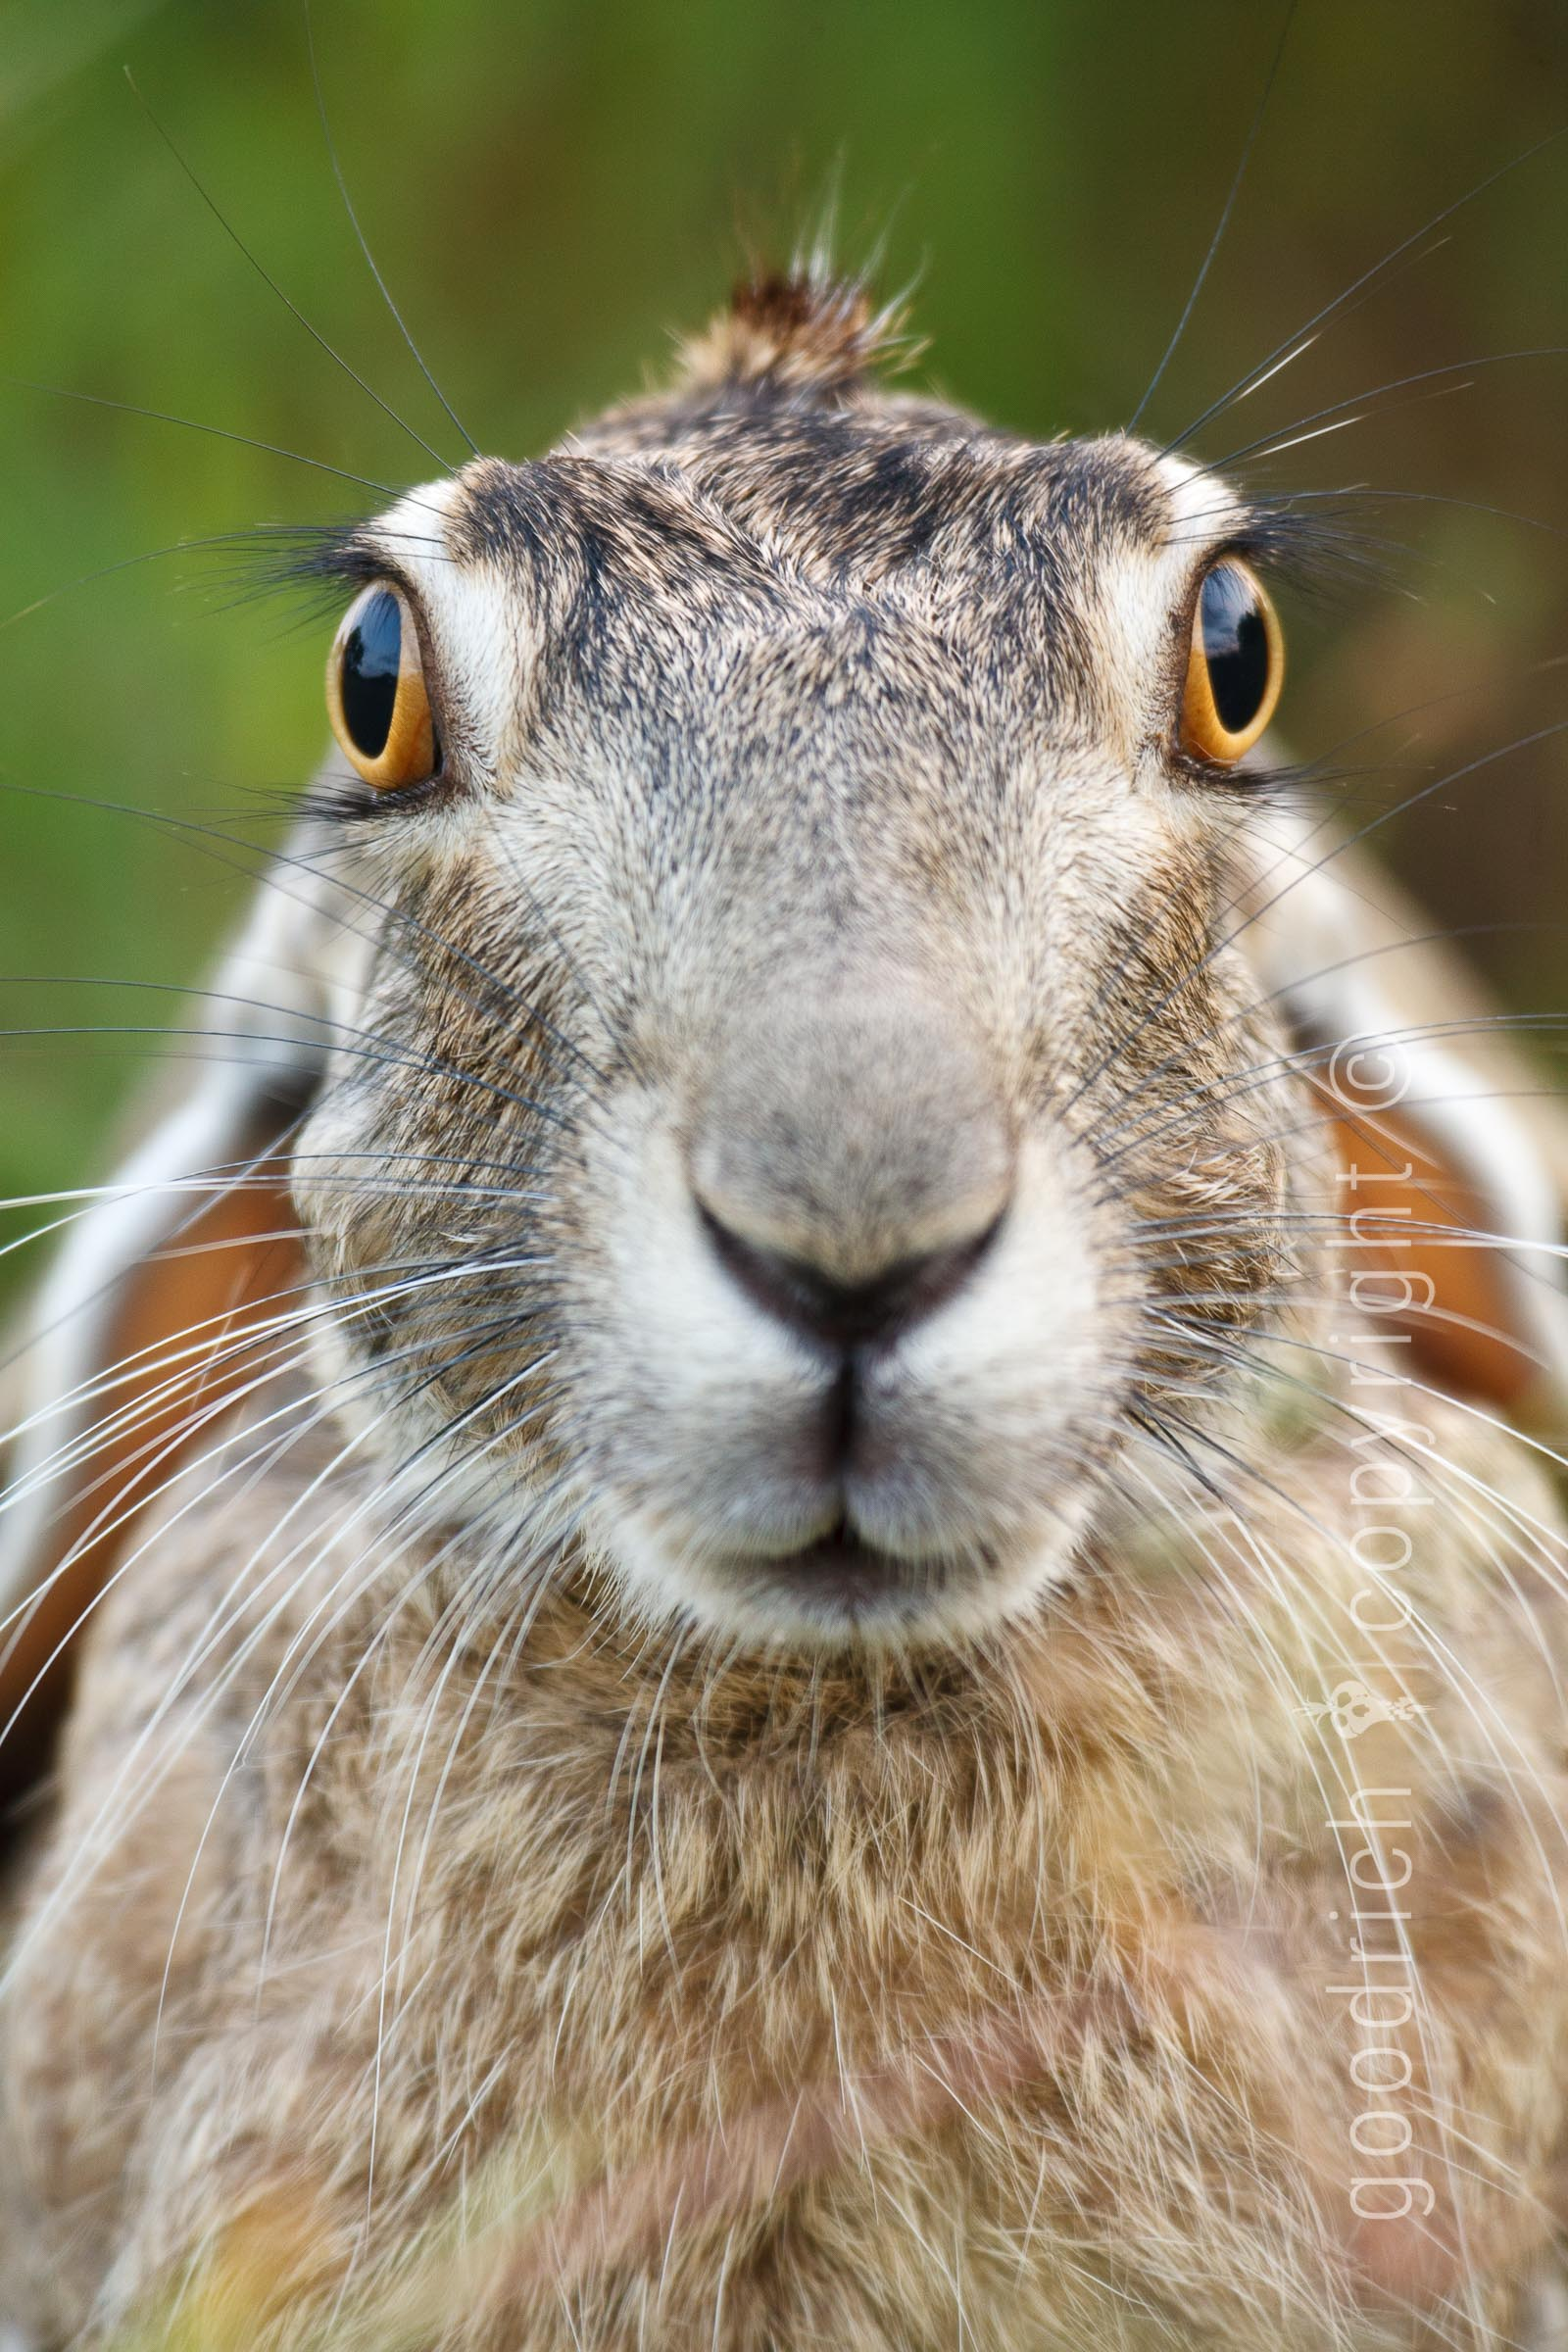 Rabbit portrait Texas by Jay Goodrich